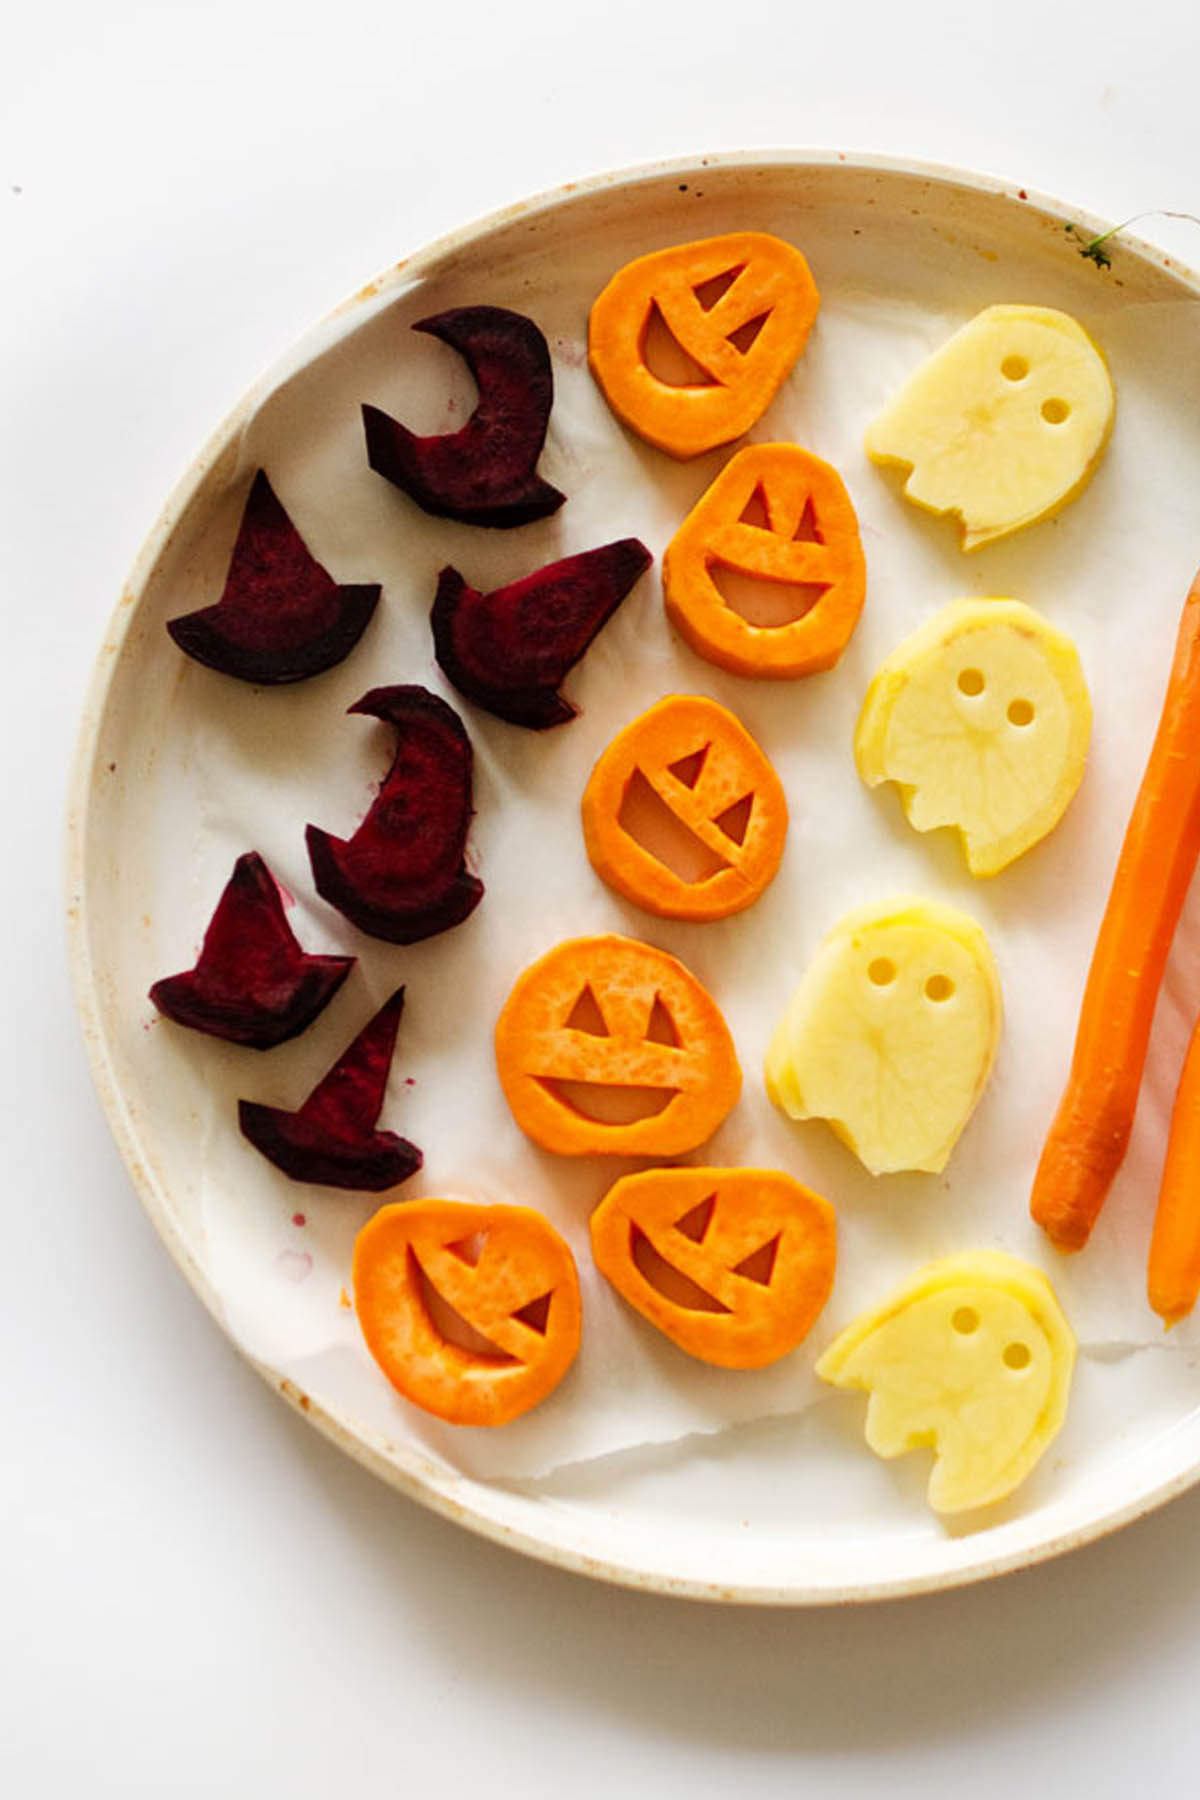 Halloween Dinner Ideas  25 Spooky Halloween Dinner Ideas Best Recipes for